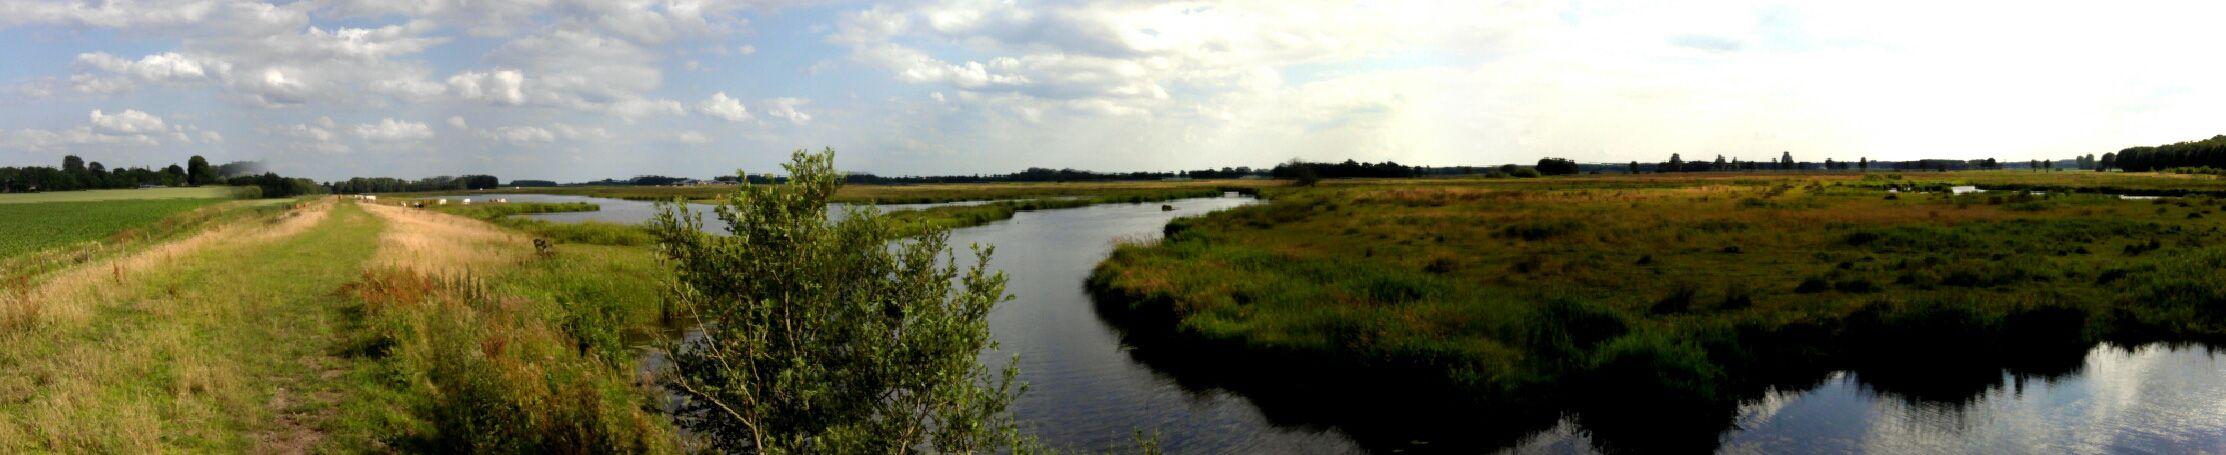 voetzoekers-annermoeras-panorama